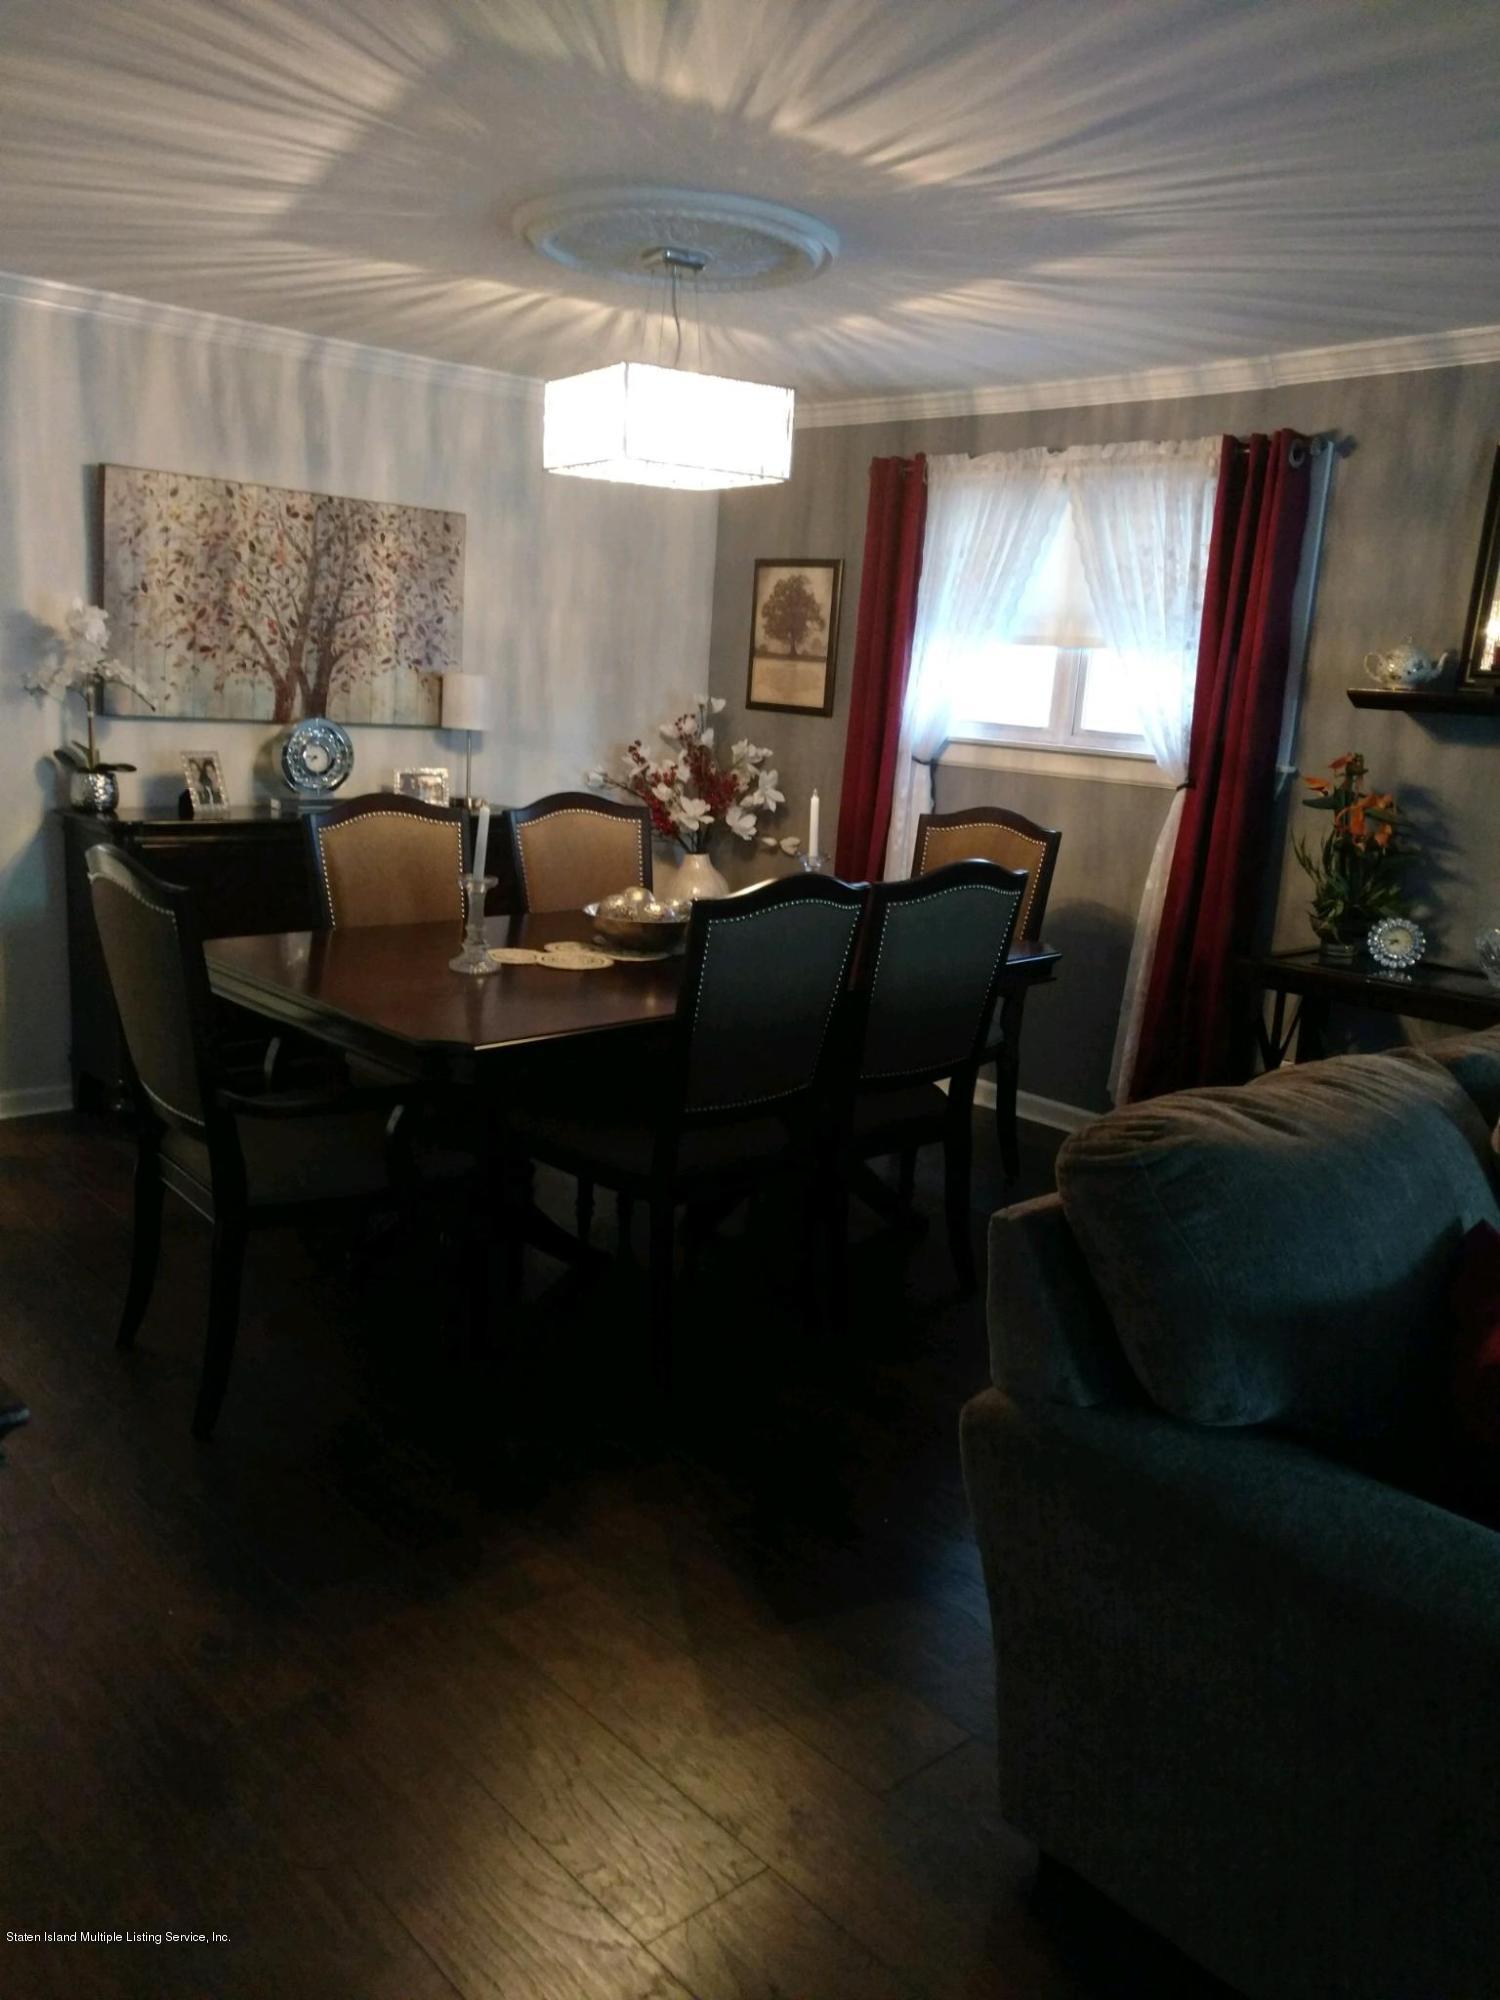 Single Family - Semi-Attached 102 Stack Drive  Staten Island, NY 10312, MLS-1115880-4